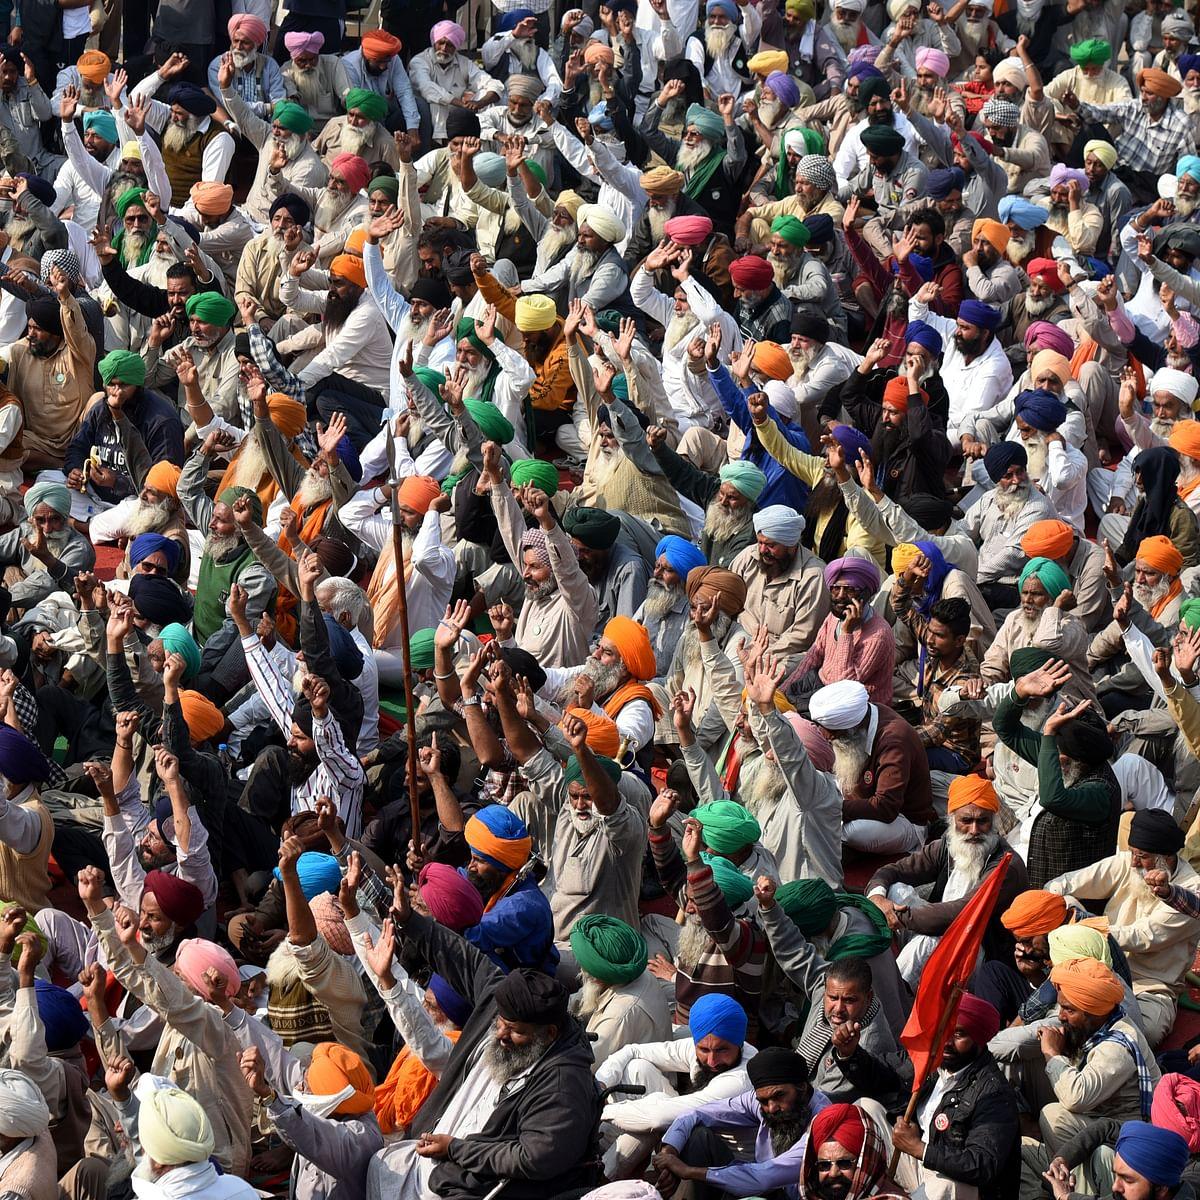 (Representative Image) Farmers protesting at Delhi's Singhu border (Photo by Sonu Mehta/Hindustan Times via Getty Images)